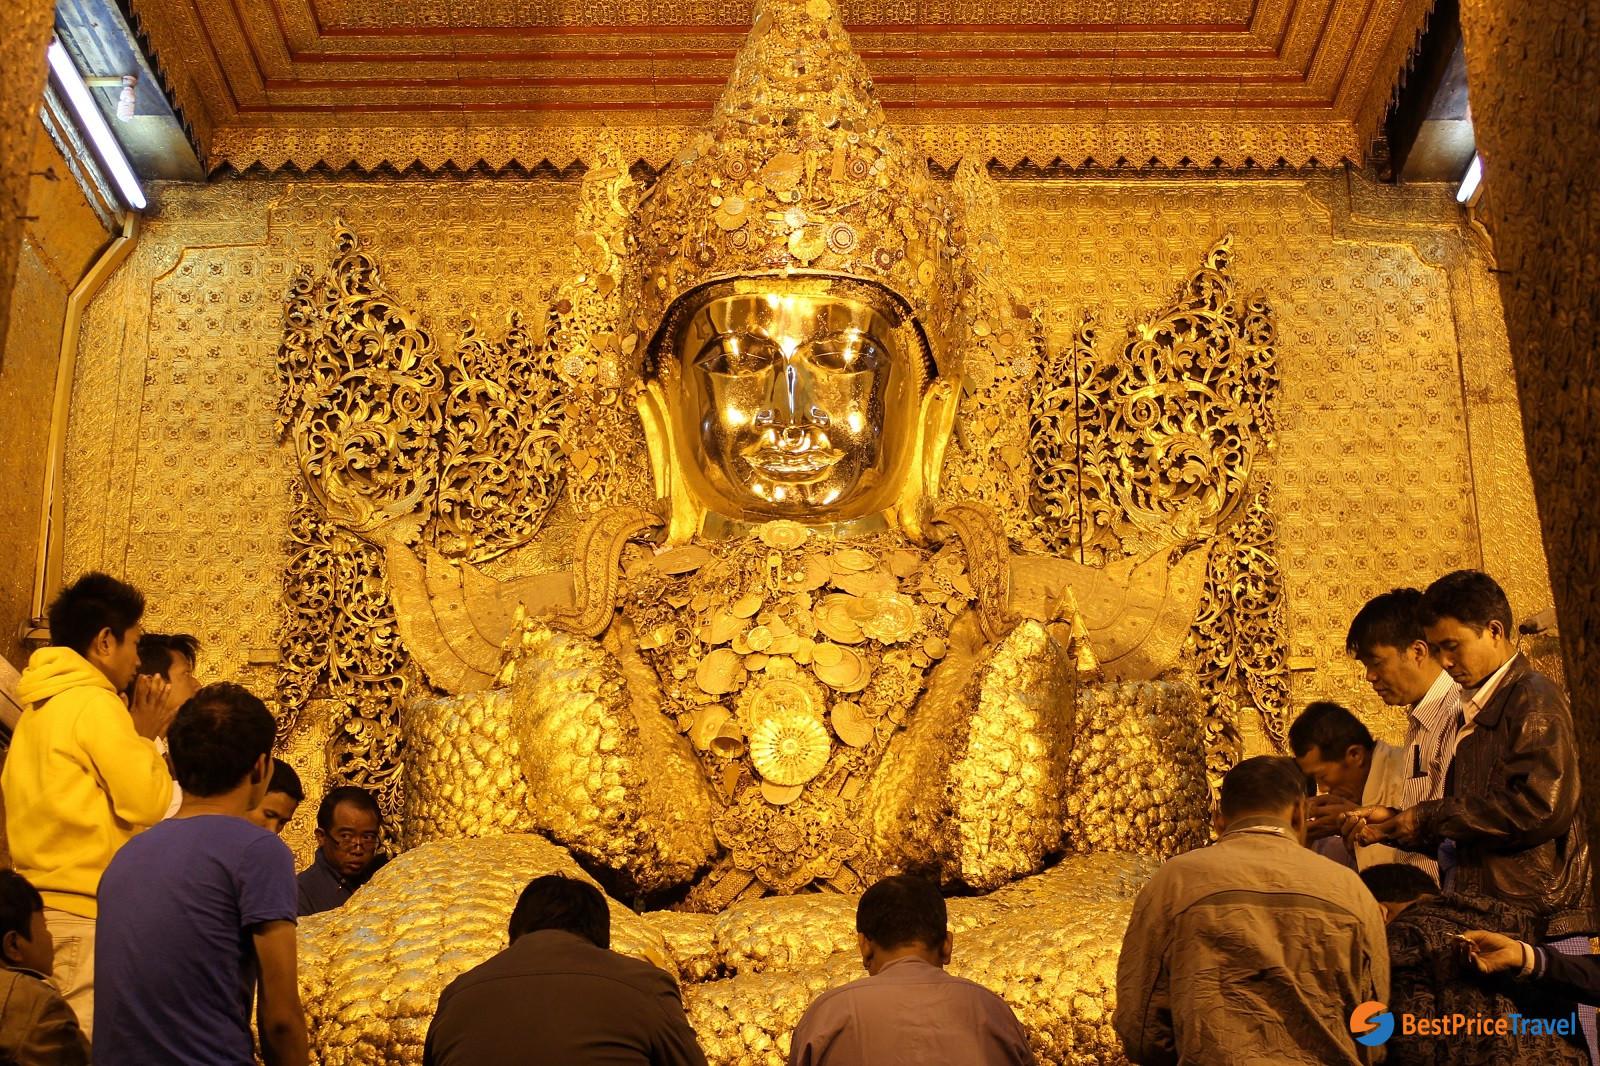 The giant Buddha at Mahamuni Pagoda